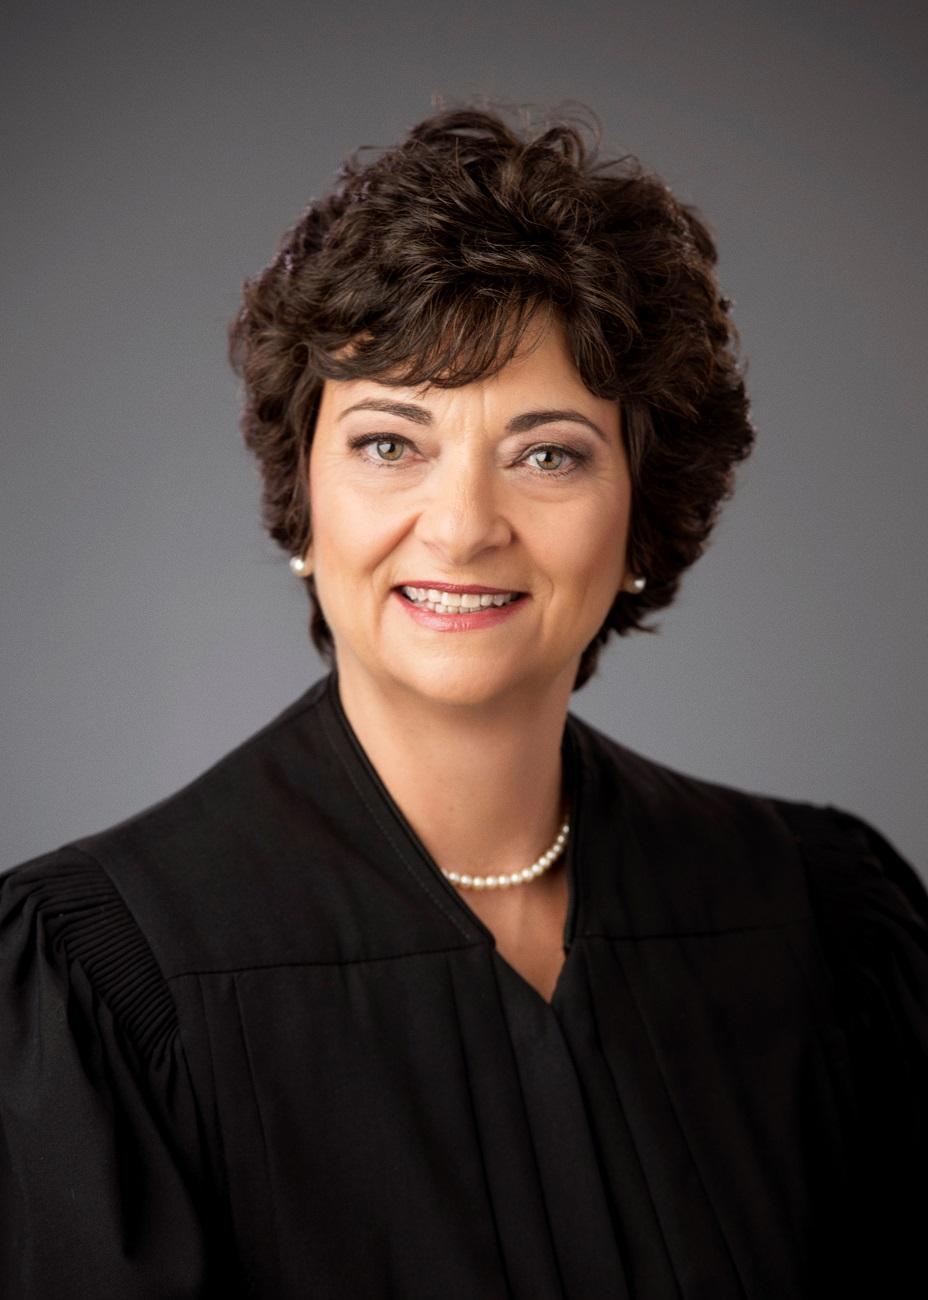 Judge Lancaster